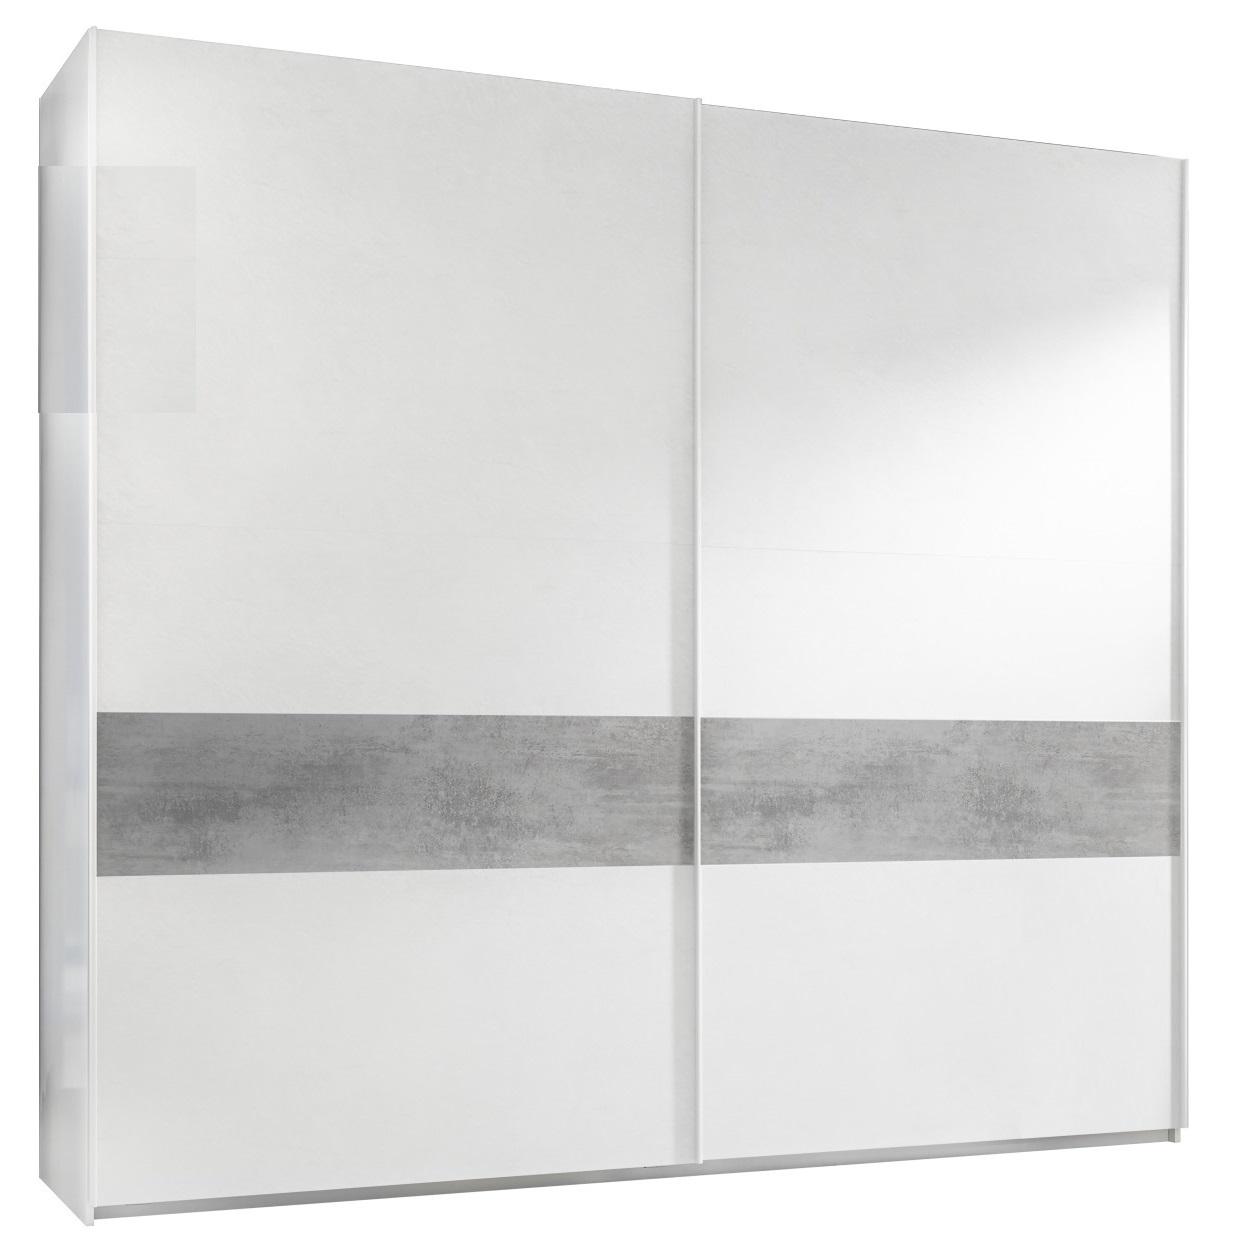 Kledingkast Amalti Alpaca 220 cm breed in mat wit met grijs beton   Pesaro Mobilia